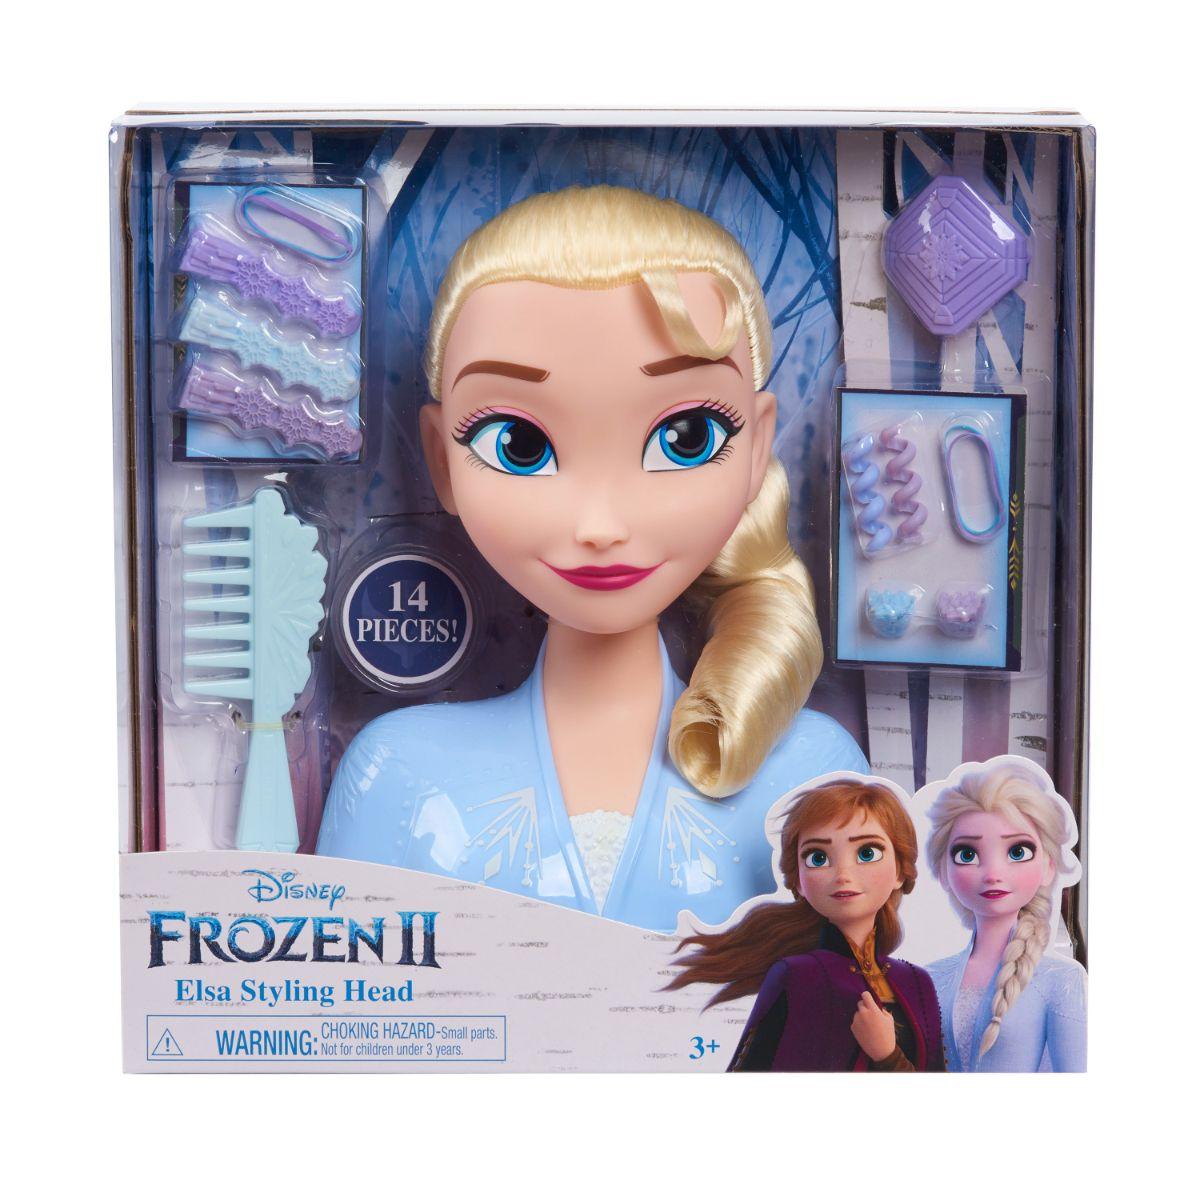 Papusa Elsa Frozen 2, Styling Head - Manechin pentru coafat cu accesorii incluse